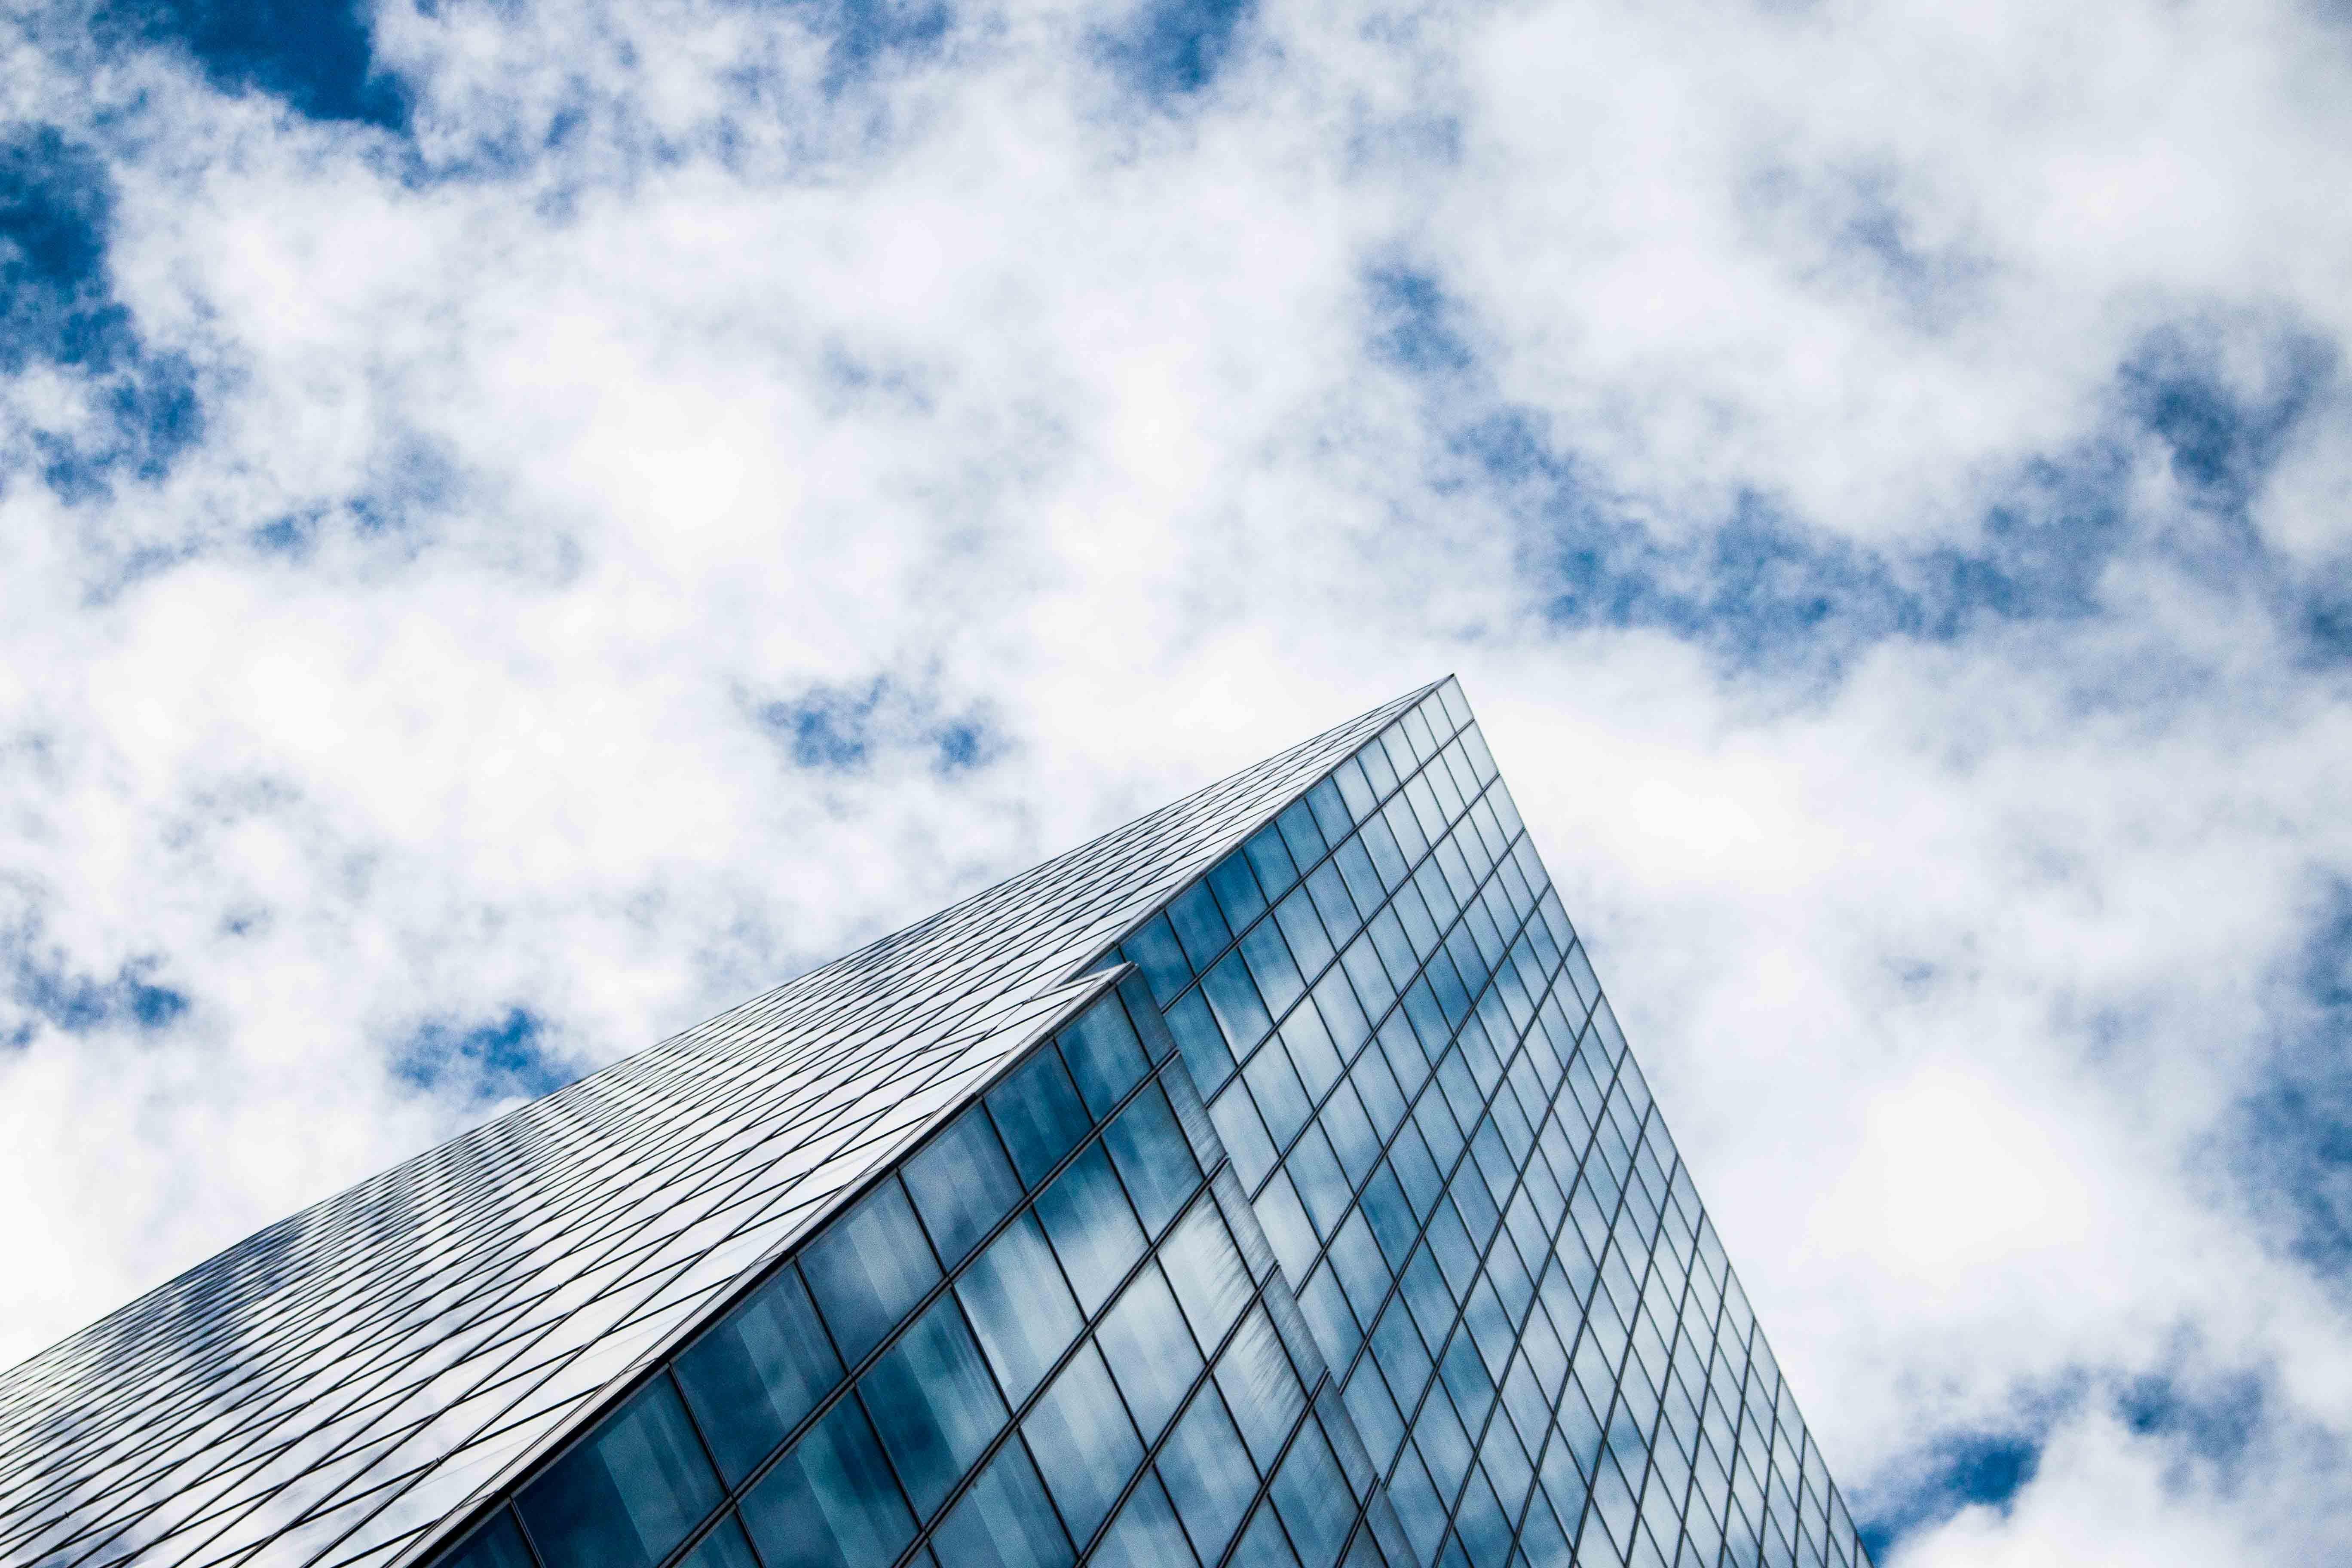 Skyscraper for Business Inspiration